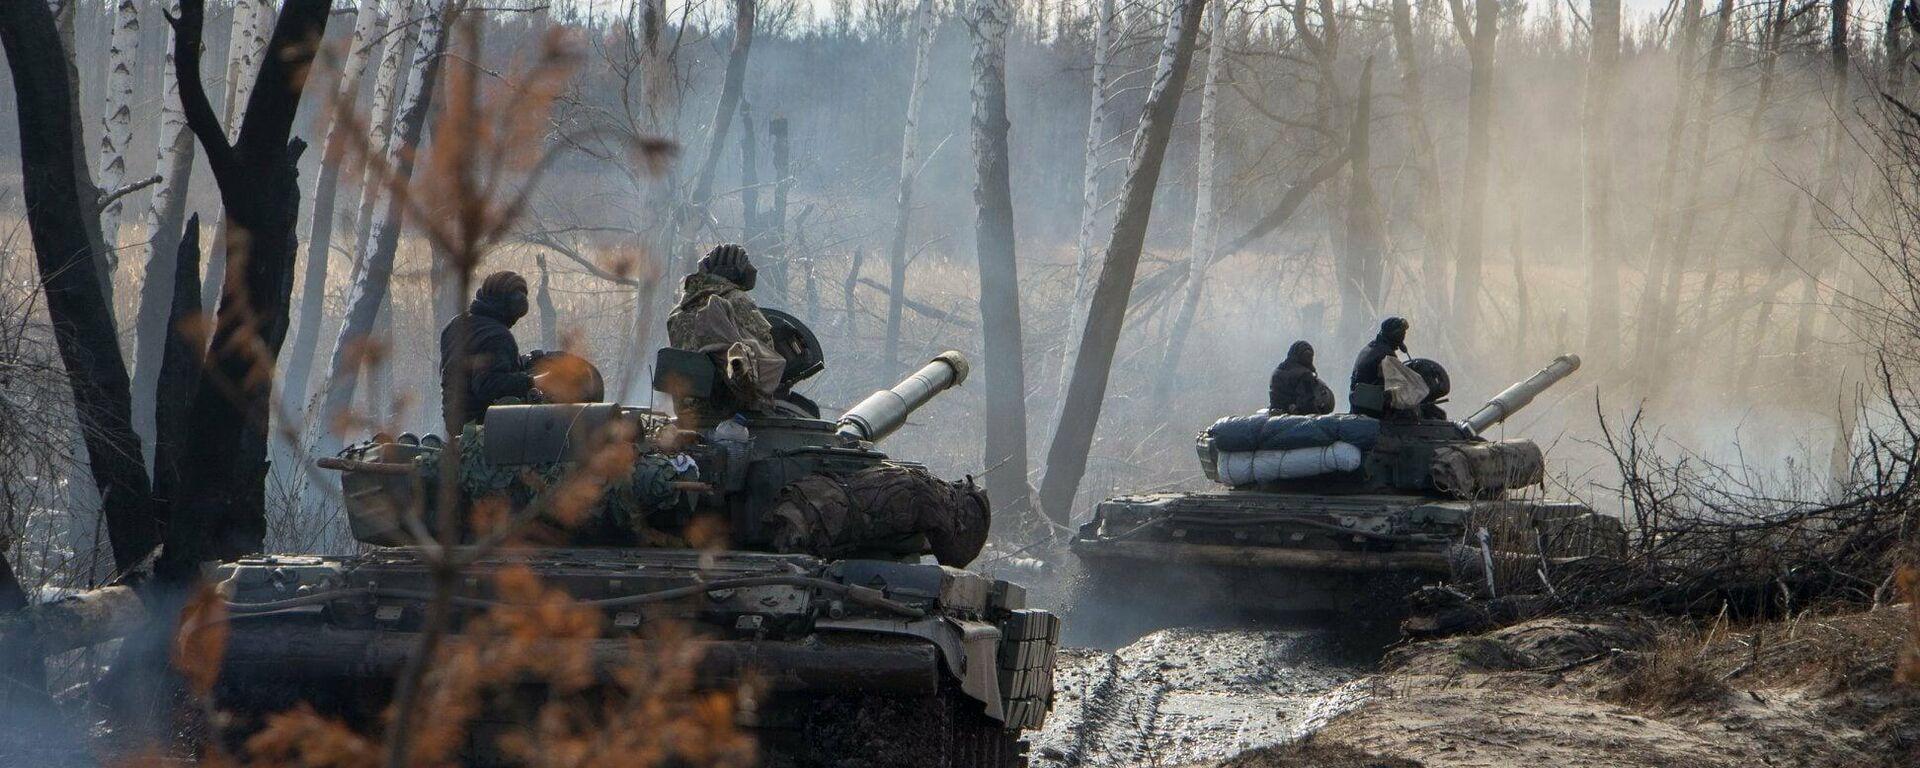 Ukrainas karavīri - Sputnik Latvija, 1920, 03.10.2021